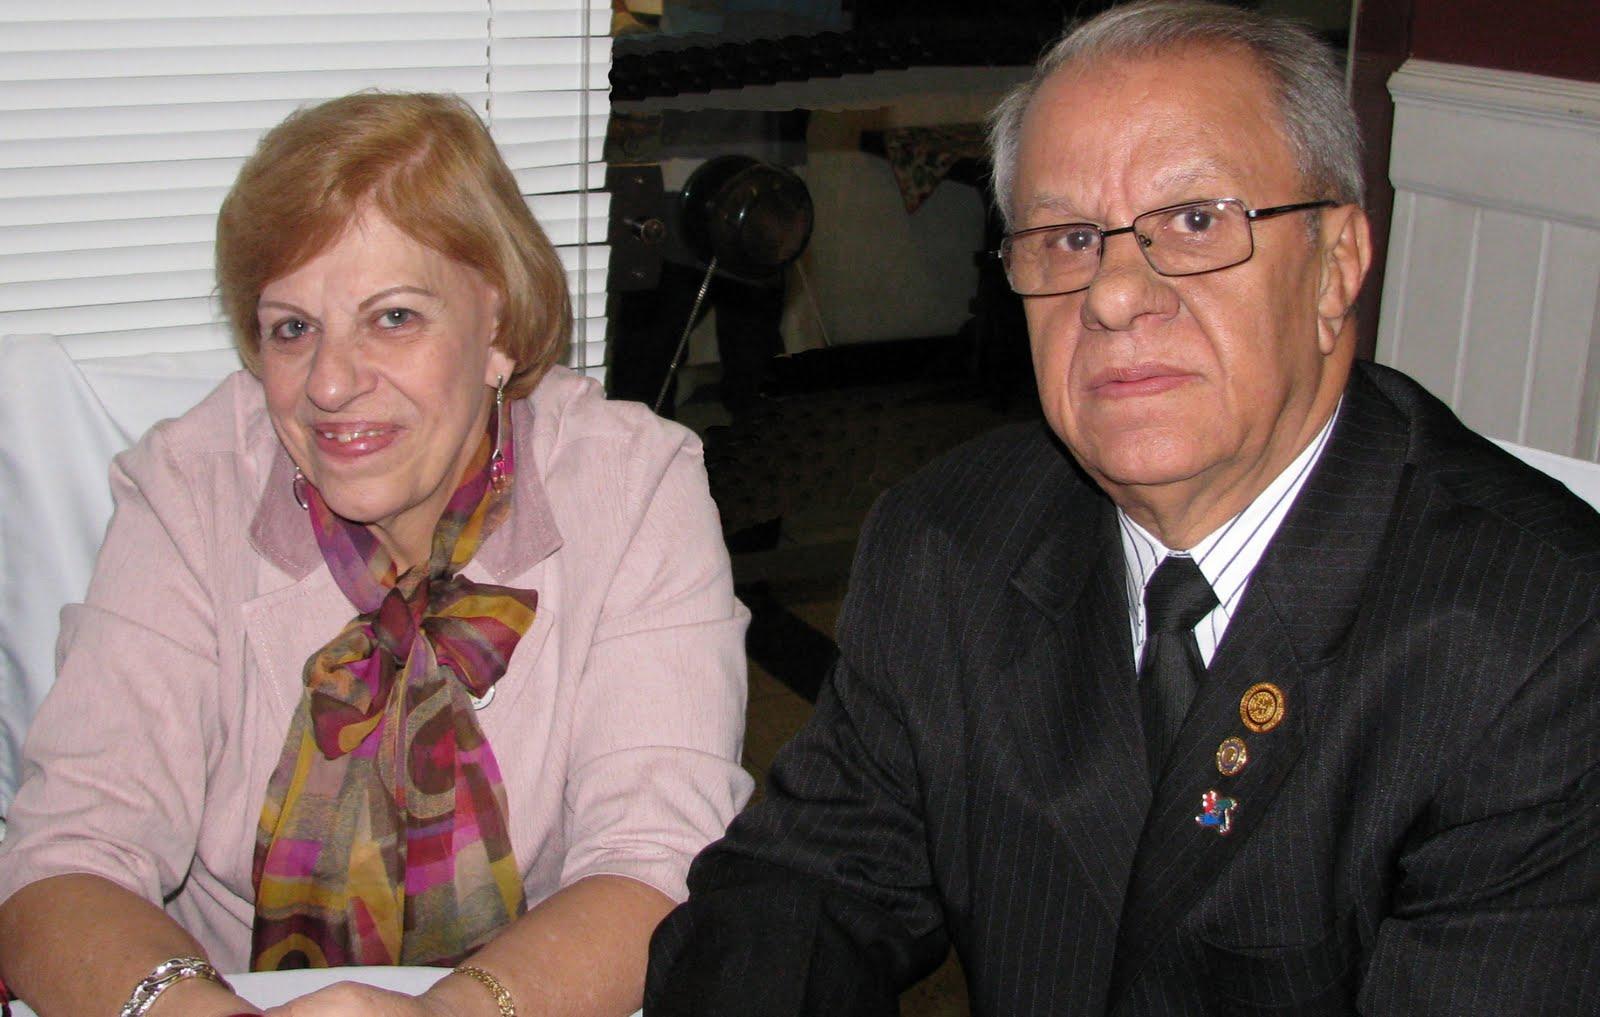 Claudionor Soares, Presidente 2011/2012 e sua esposa Áurea Dalboni Soares